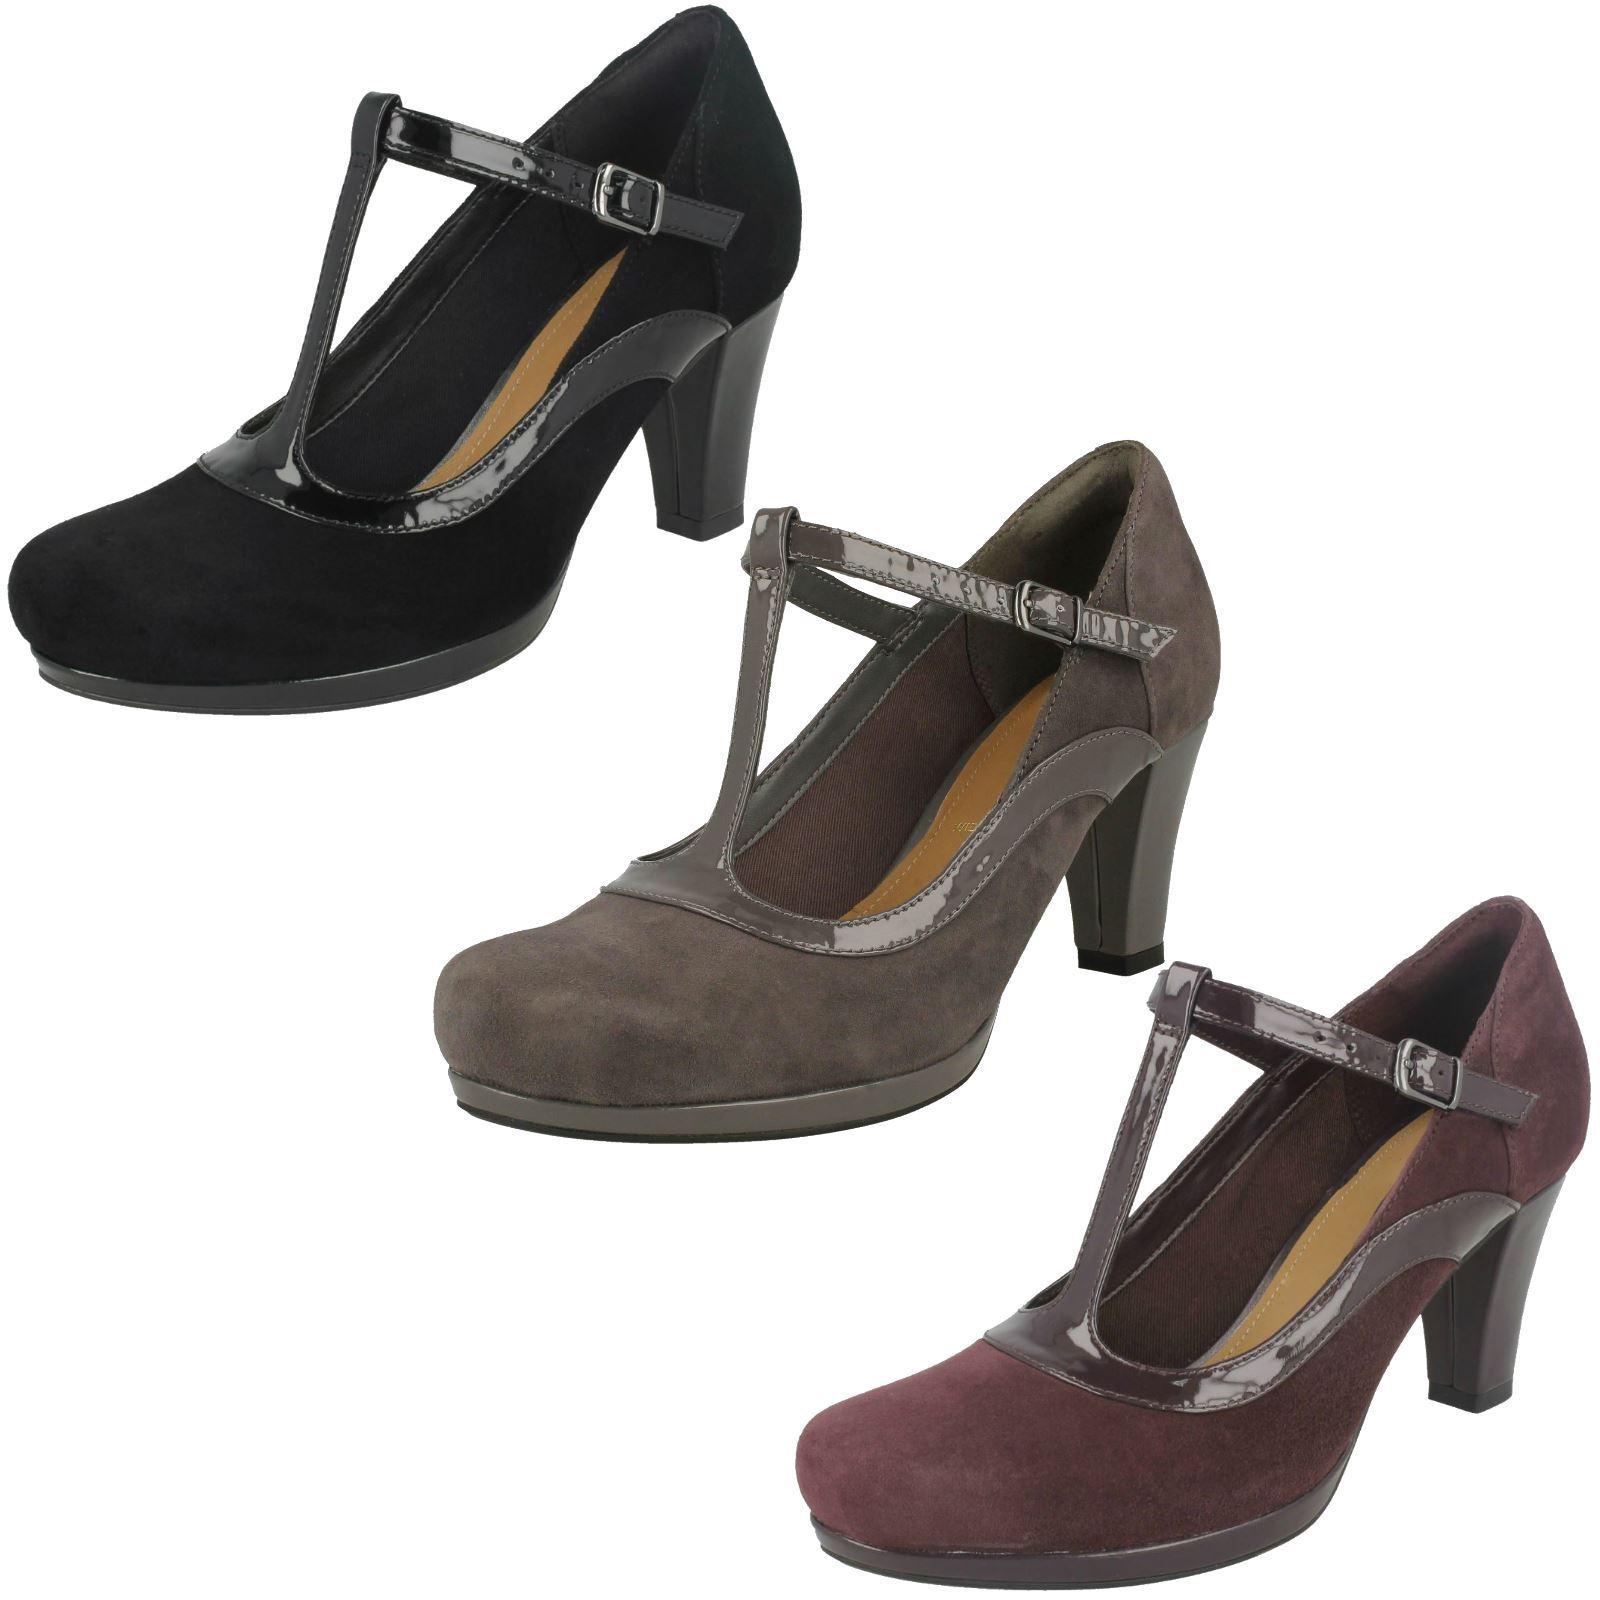 acquista marca Sandali Donna Clarks Scarpe Con Tacco A A A CORTE  CHORUS  Pitch  alta qualità